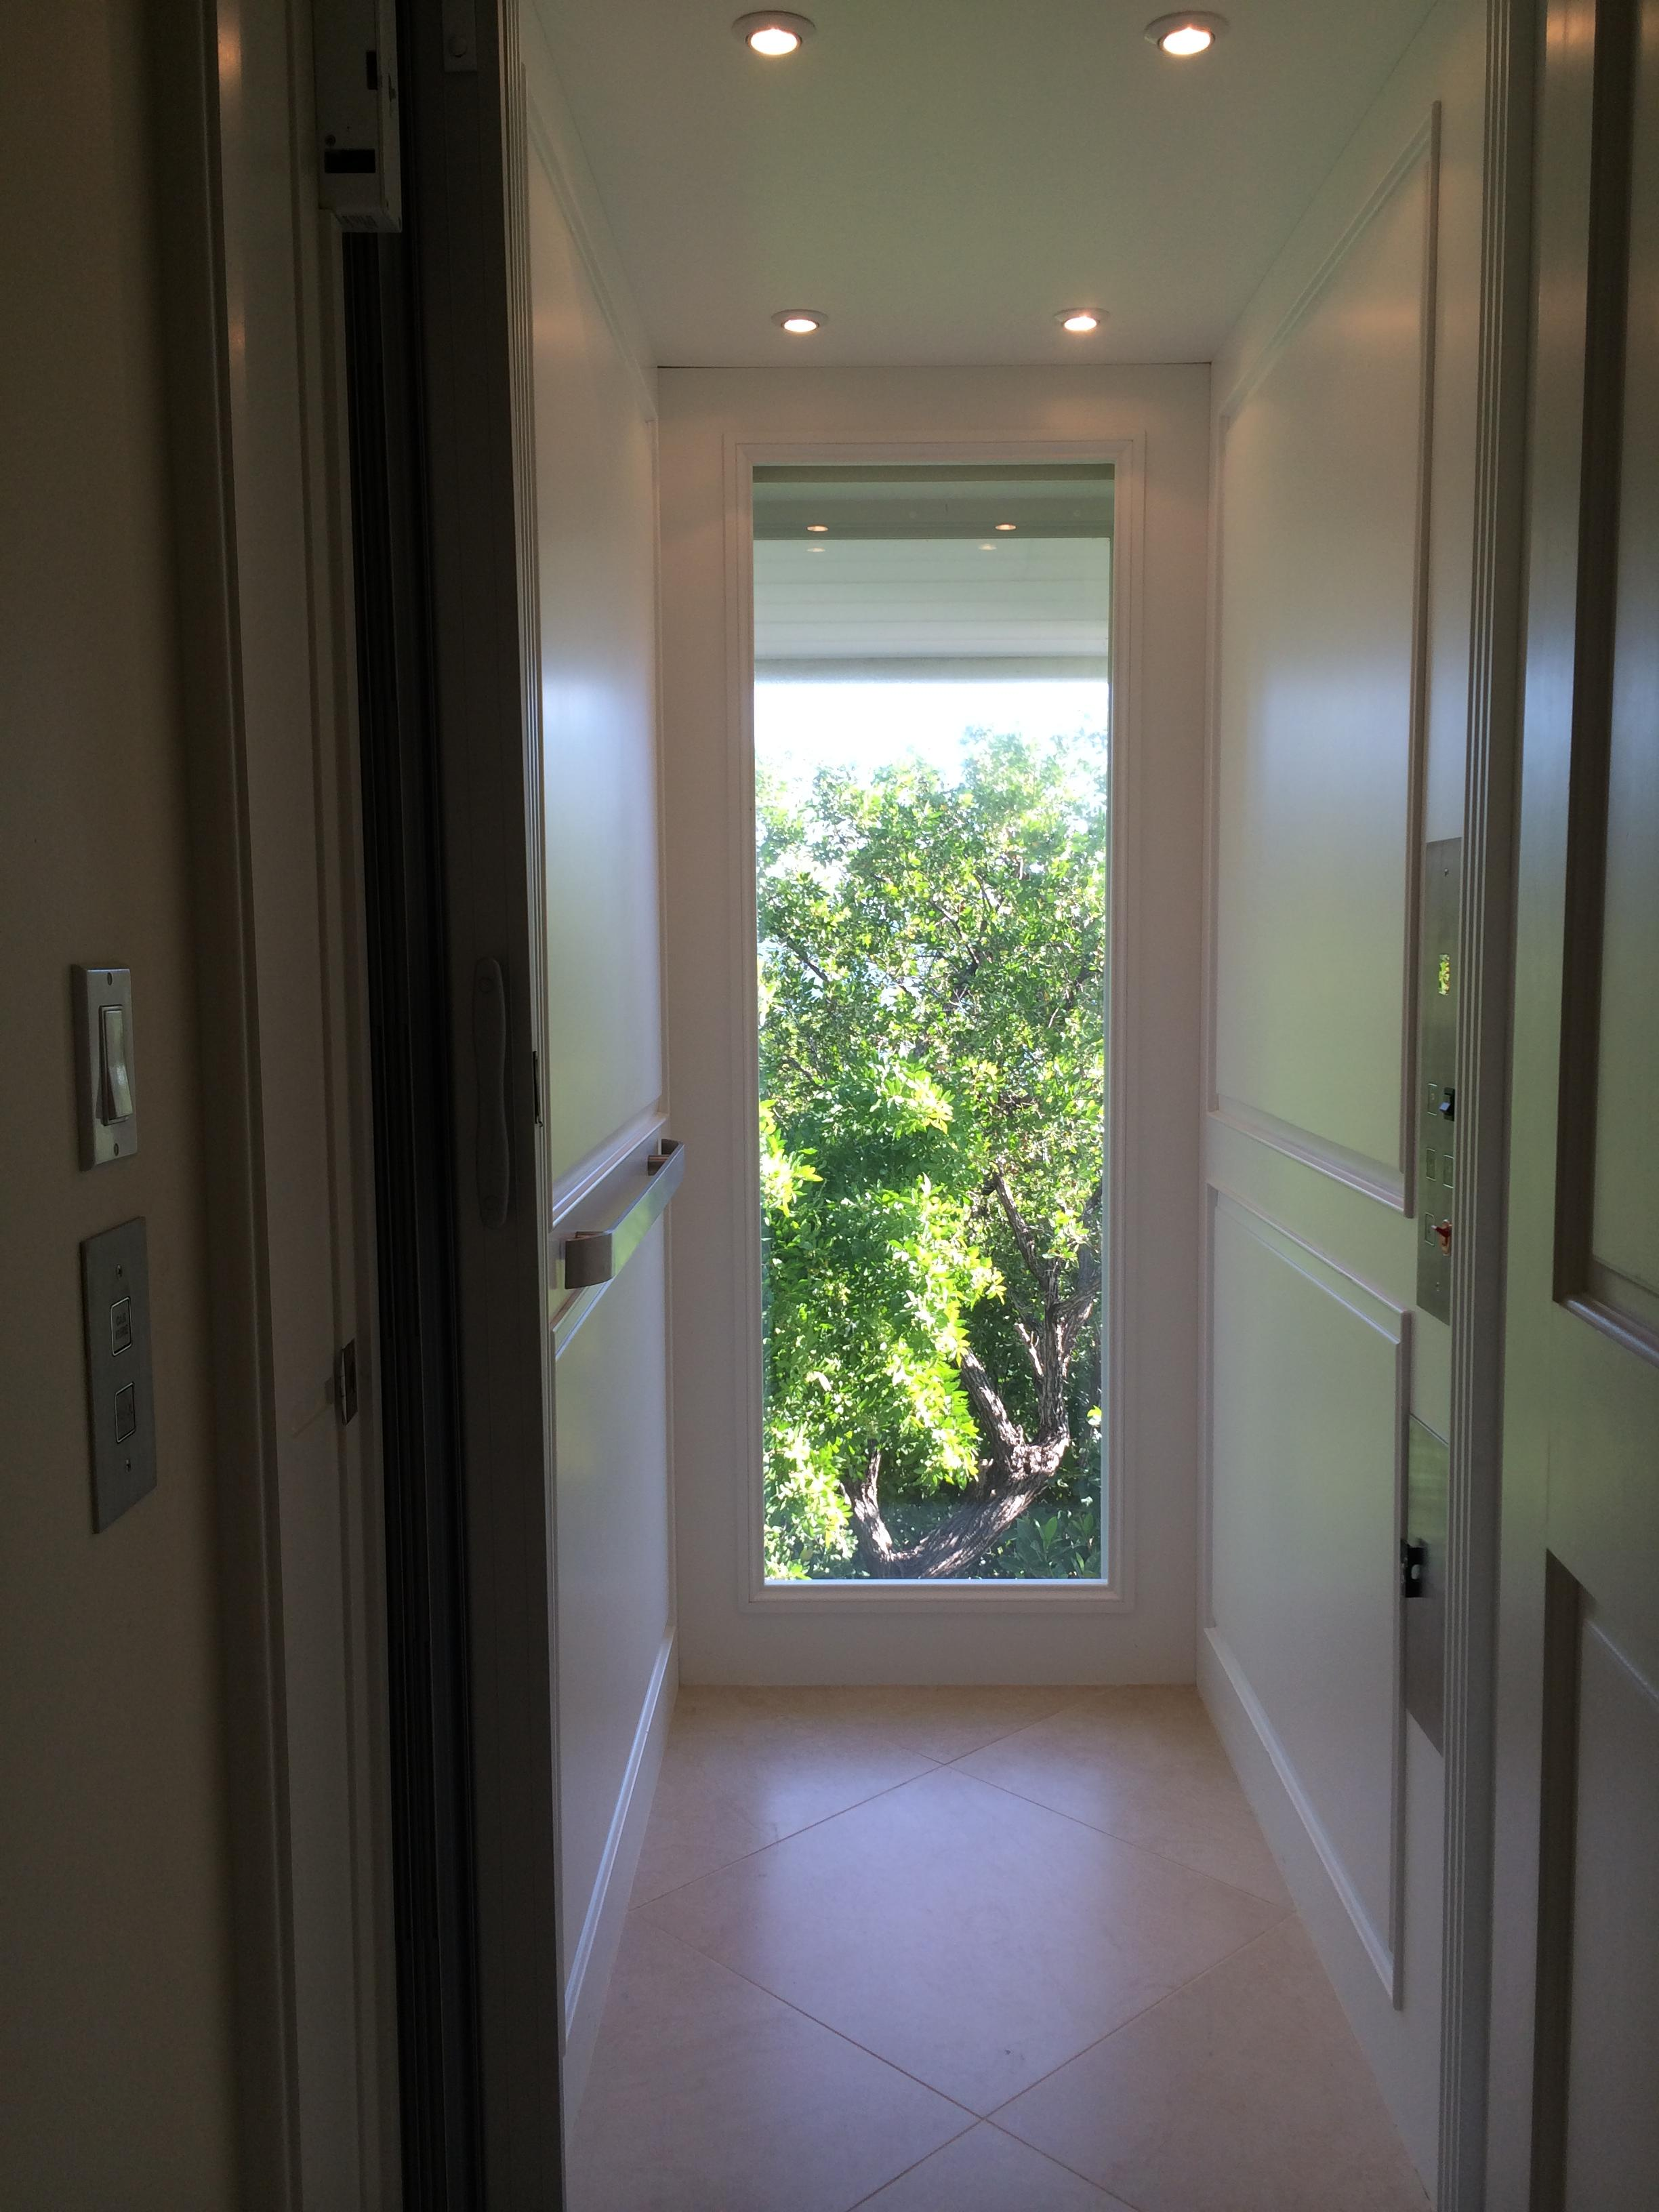 Islamorada Elevator Co. image 1